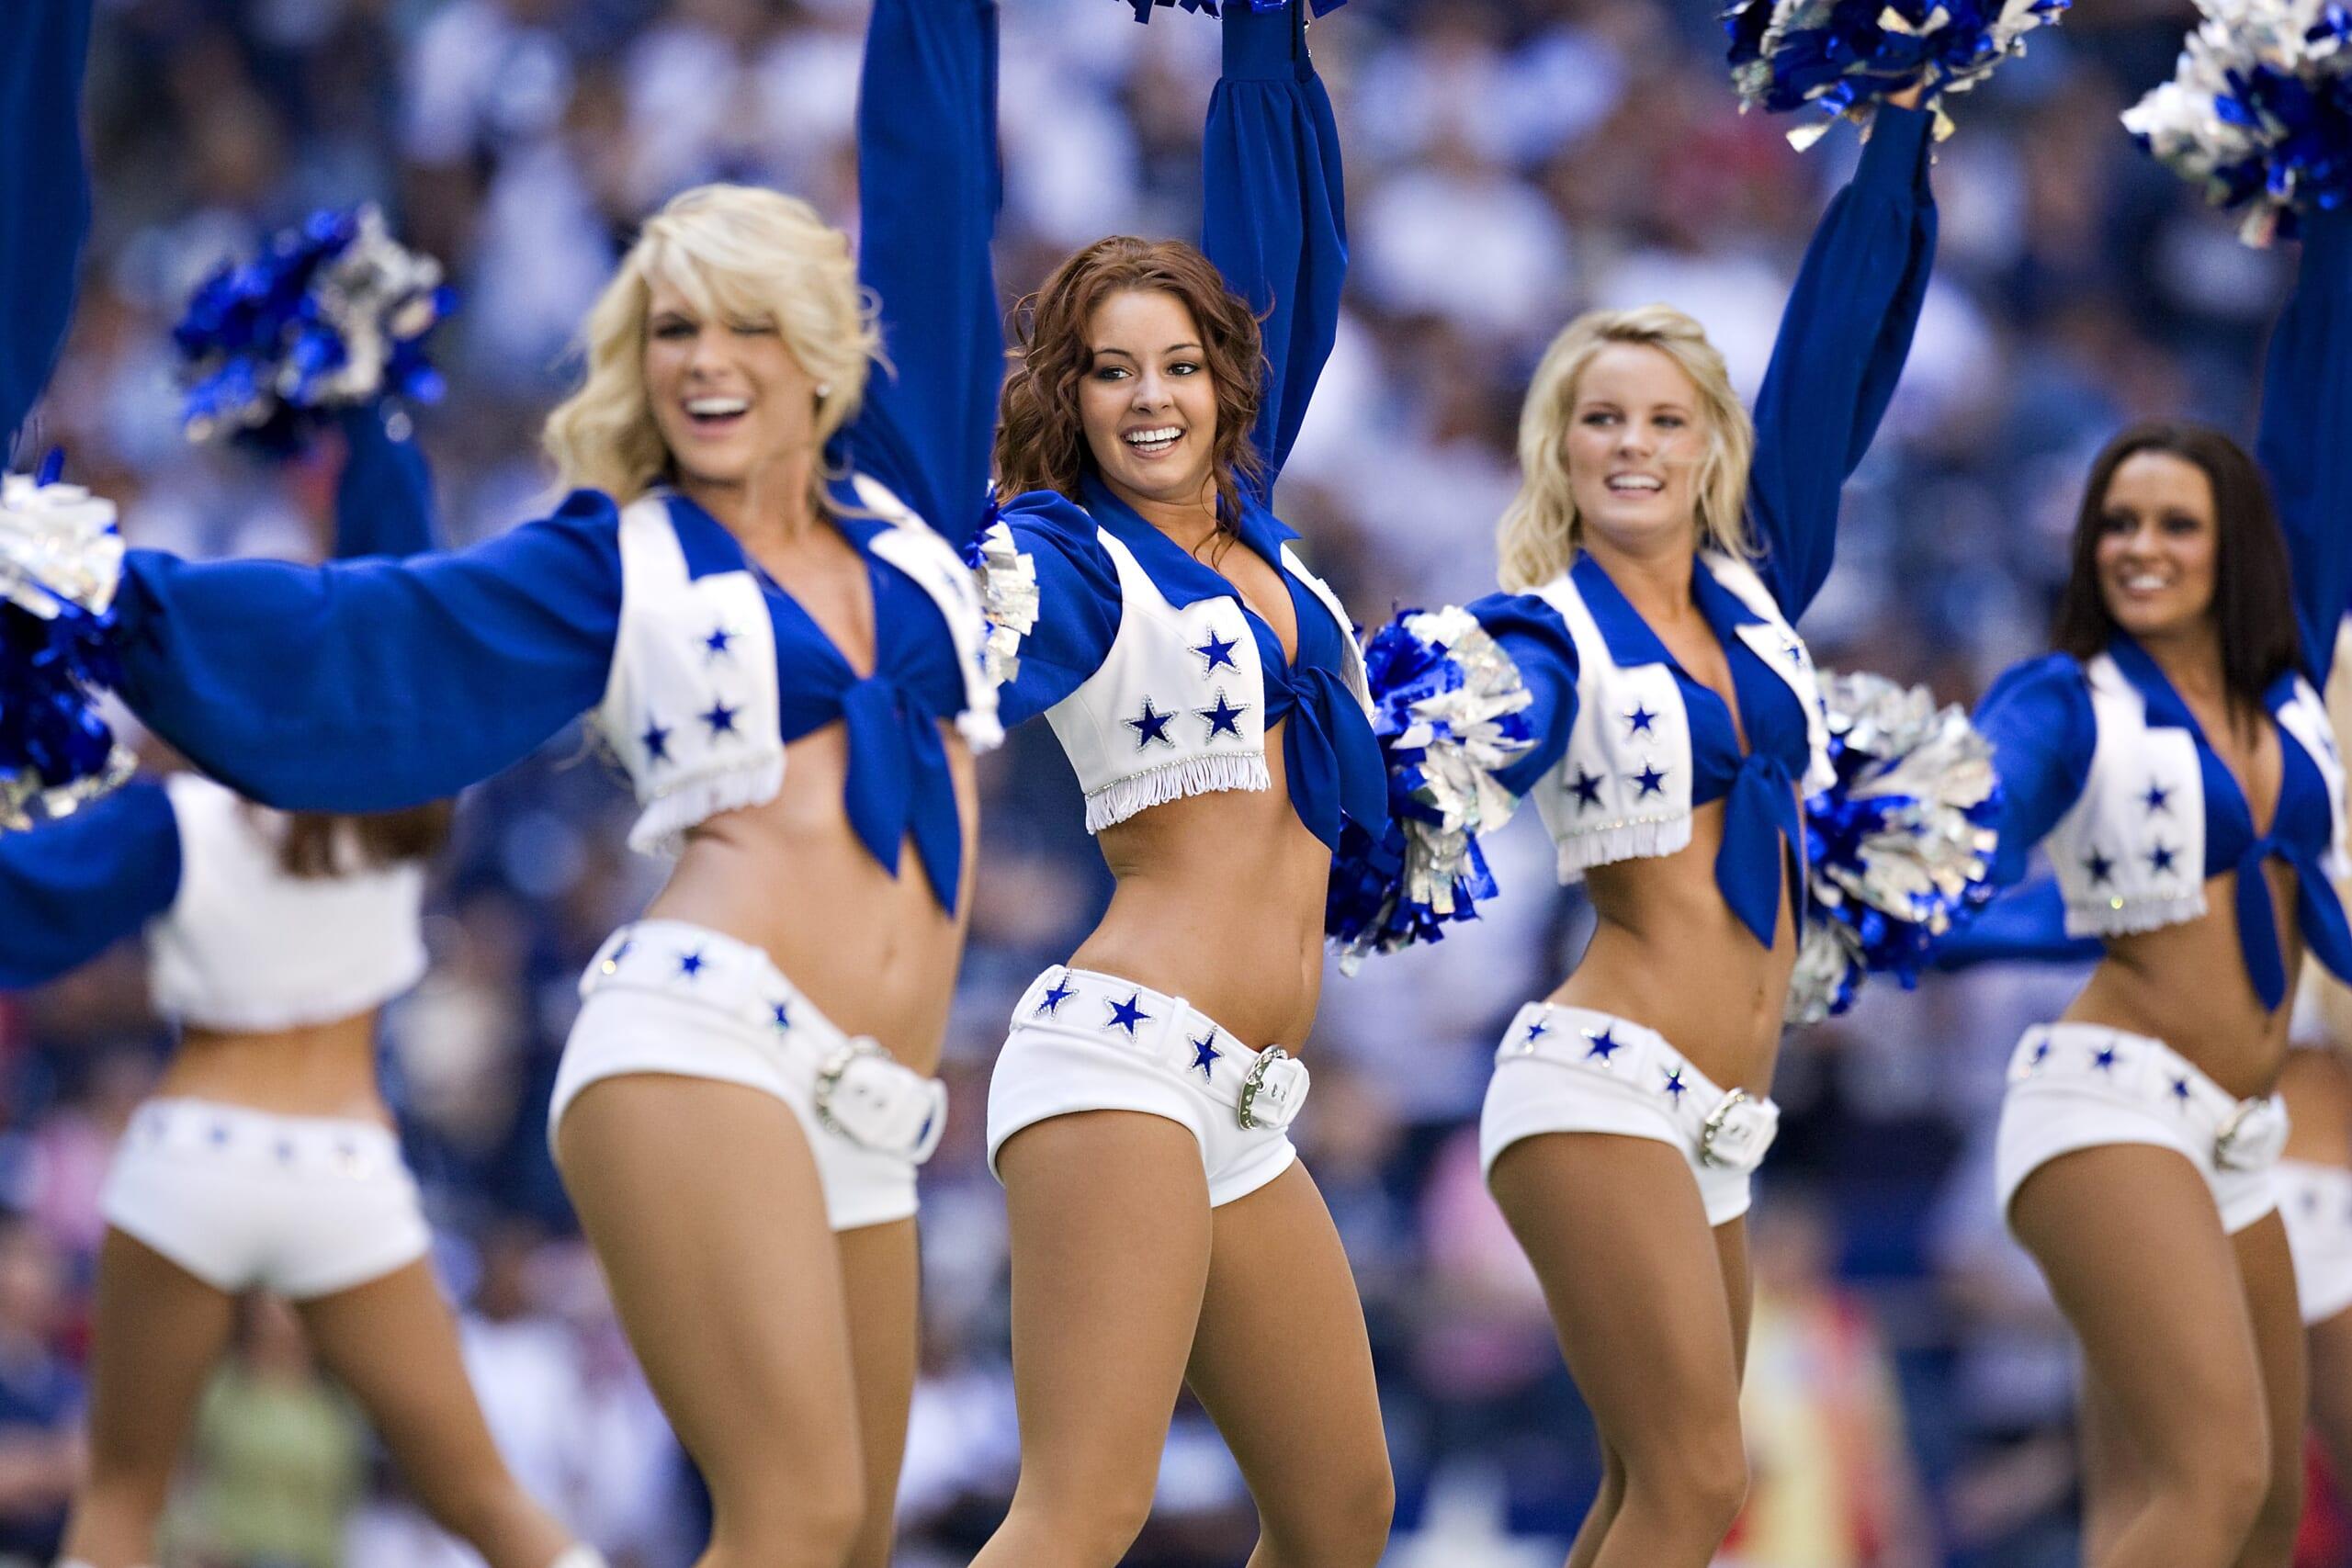 Dallas Cowboys Cheerleaders [Getty/Wesley Hitt]